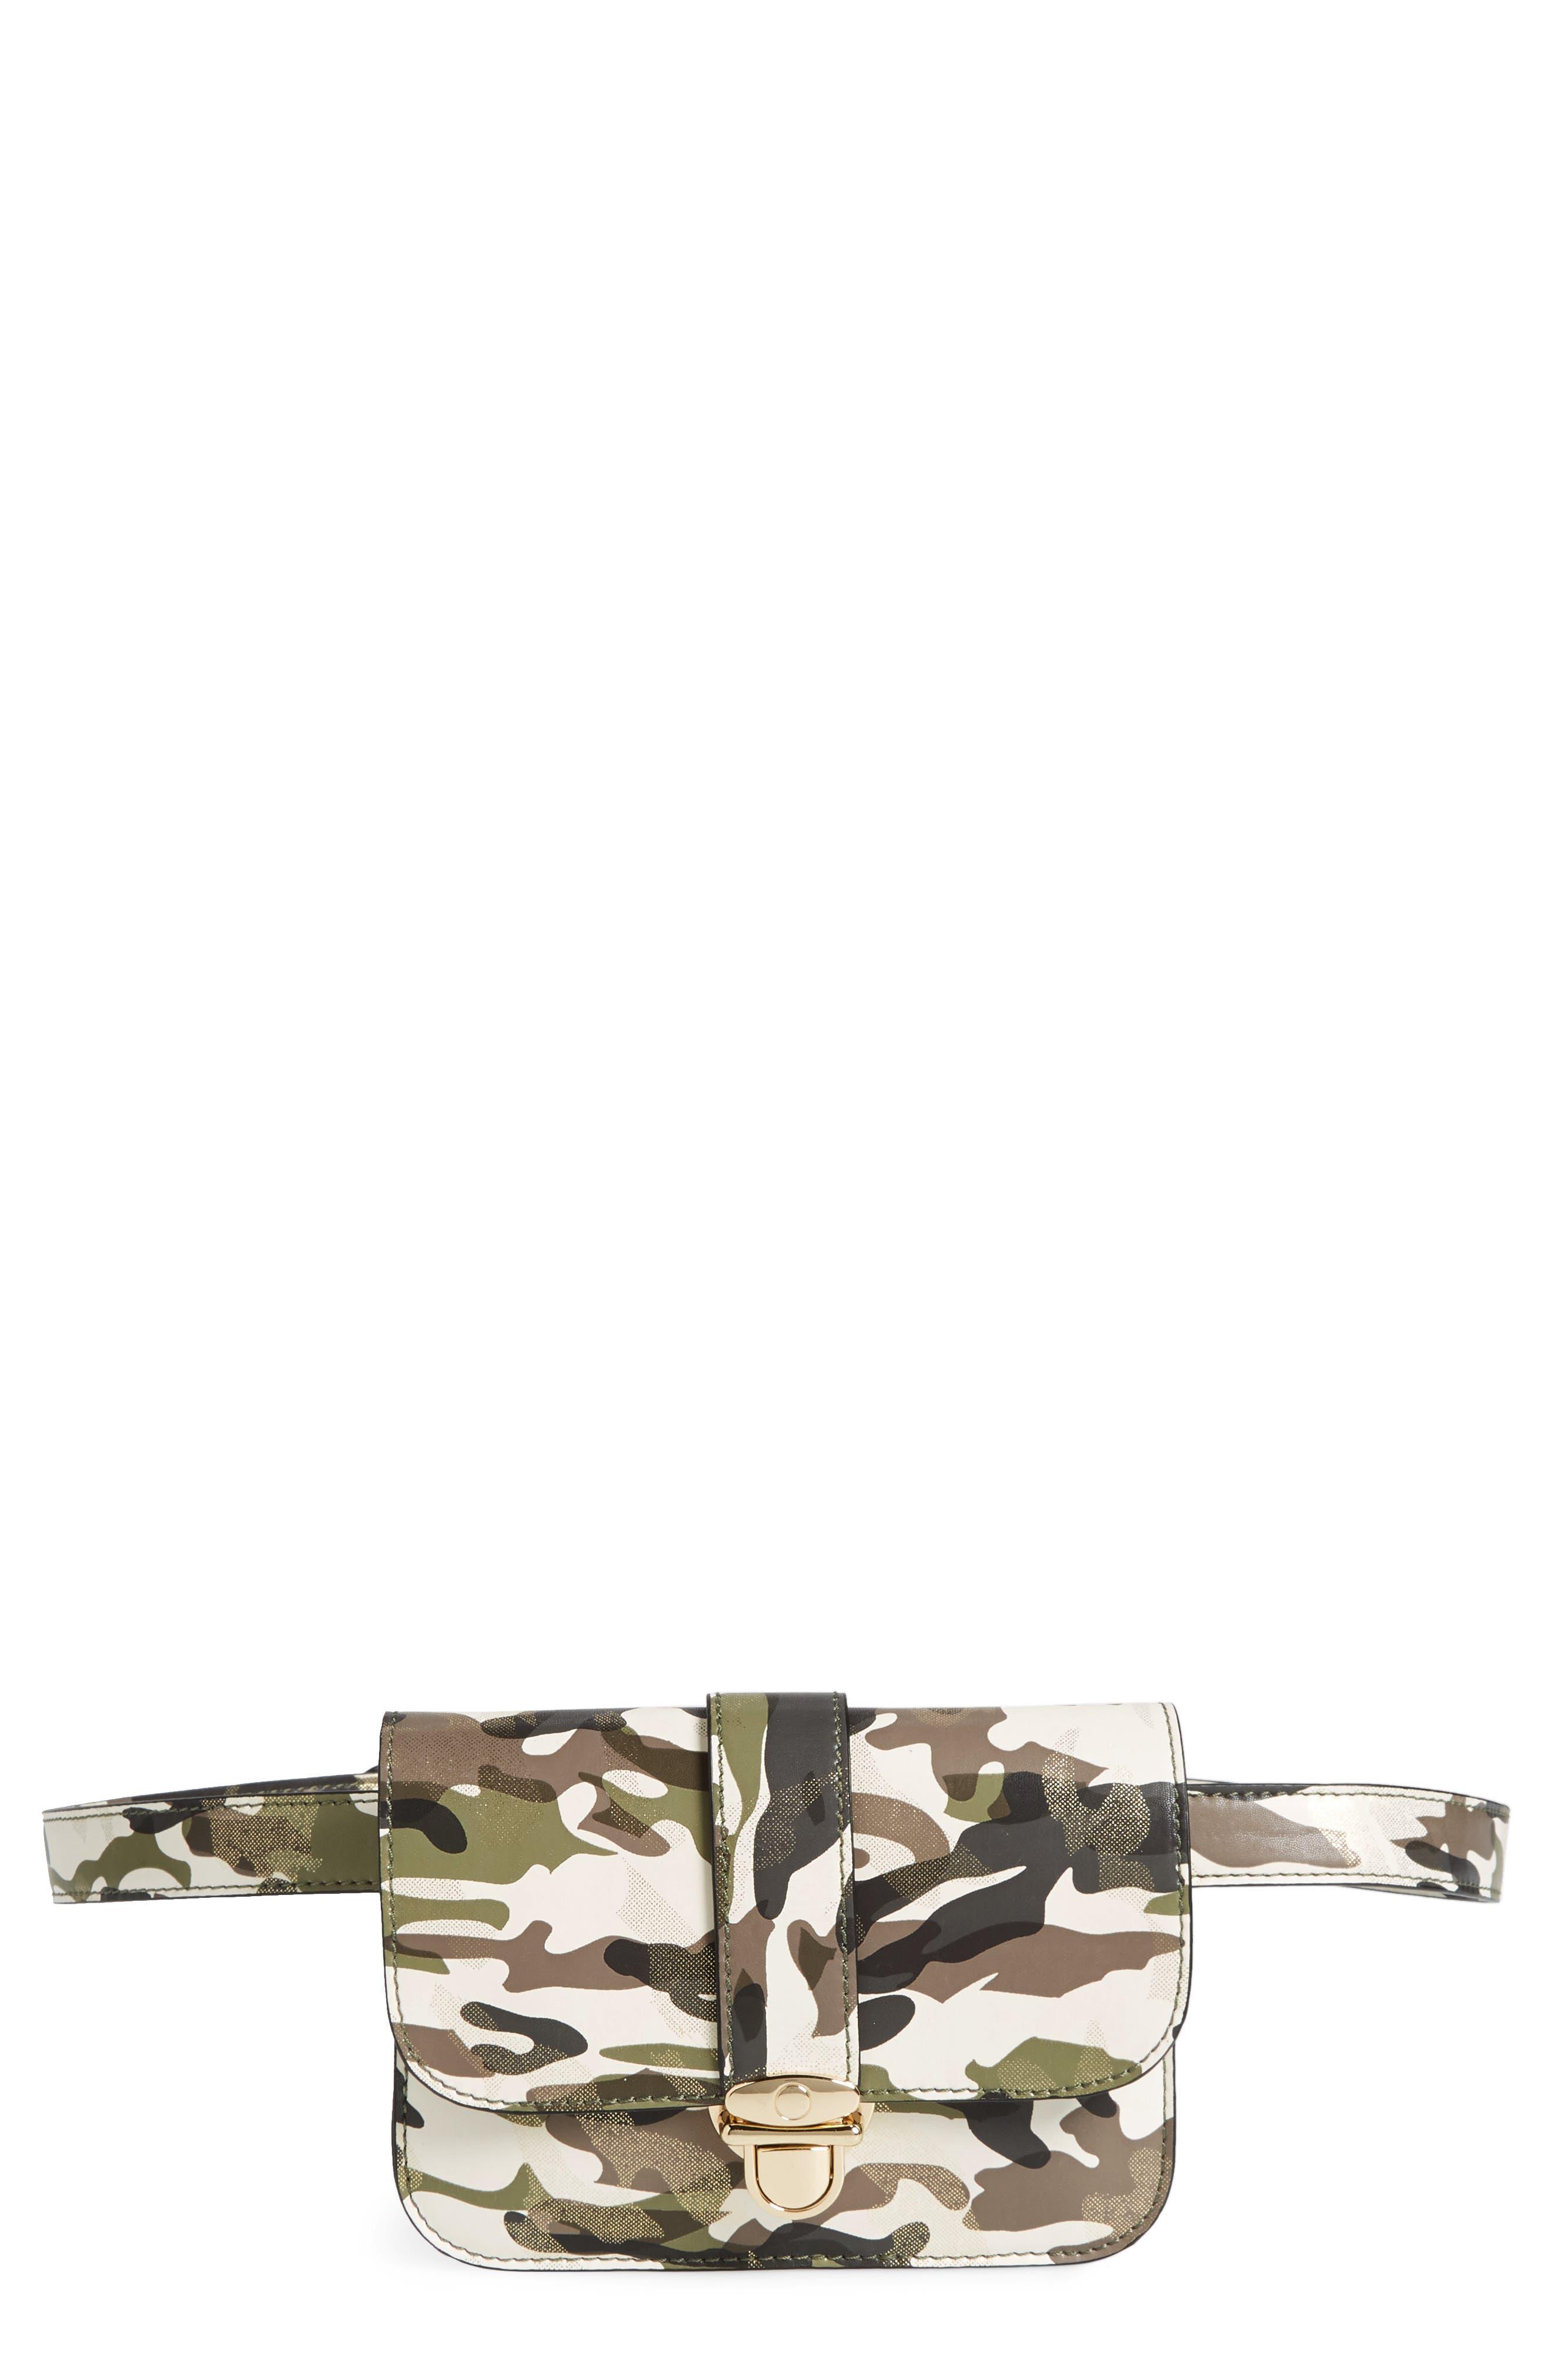 Mali + Lili Stella Camouflage Vegan Leather Crossbody Belt Bag,                         Main,                         color, CAMOUFLAGE